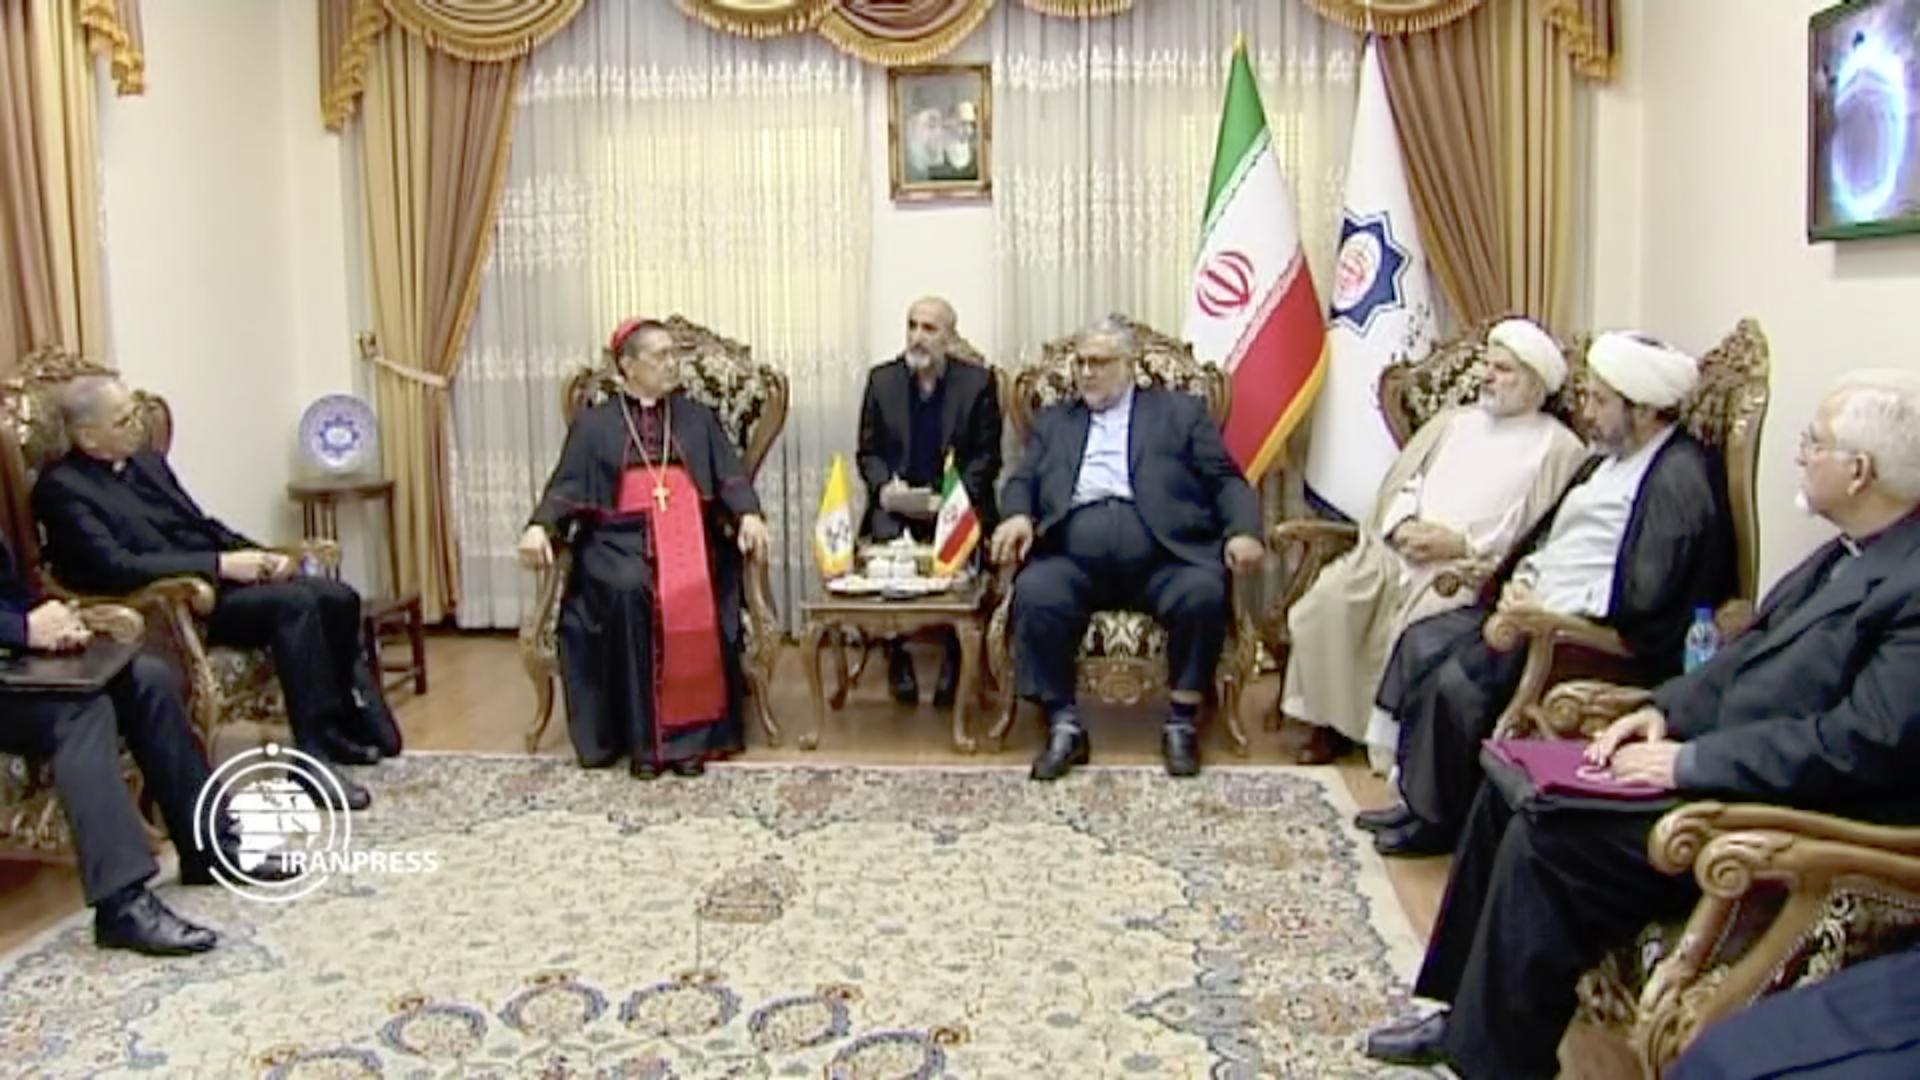 Card. Ayuso Guixot, Dialogue interreligieux à Teheran, capture @ media.iranpress.com